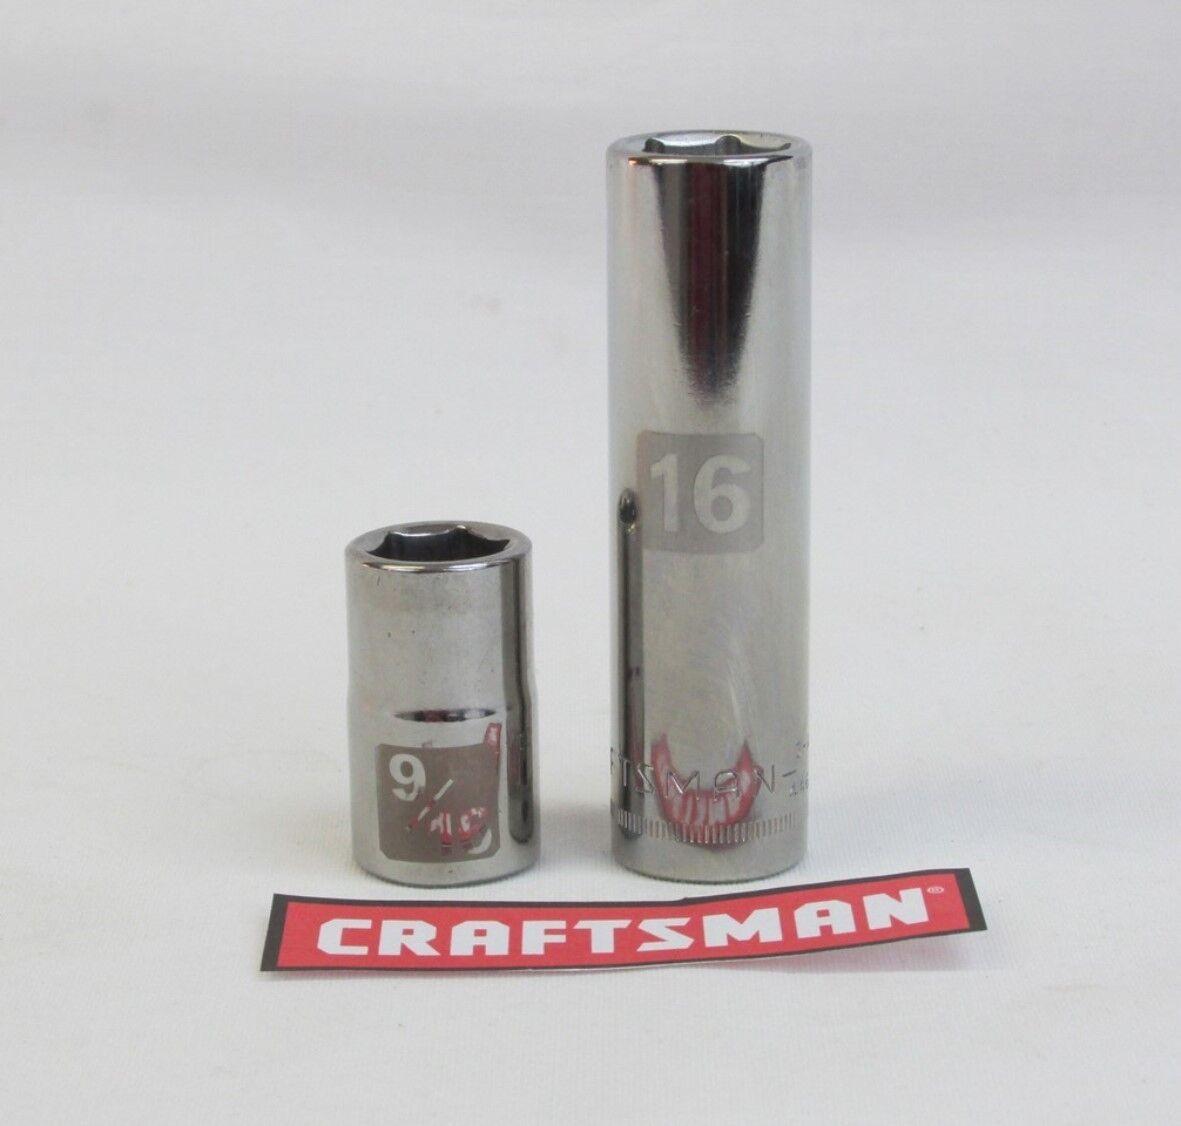 Купить Craftsman - Craftsman Easy Read Socket 6 or12pt MM or SAE 3/8 or 1/2 Drive Standard or Deep